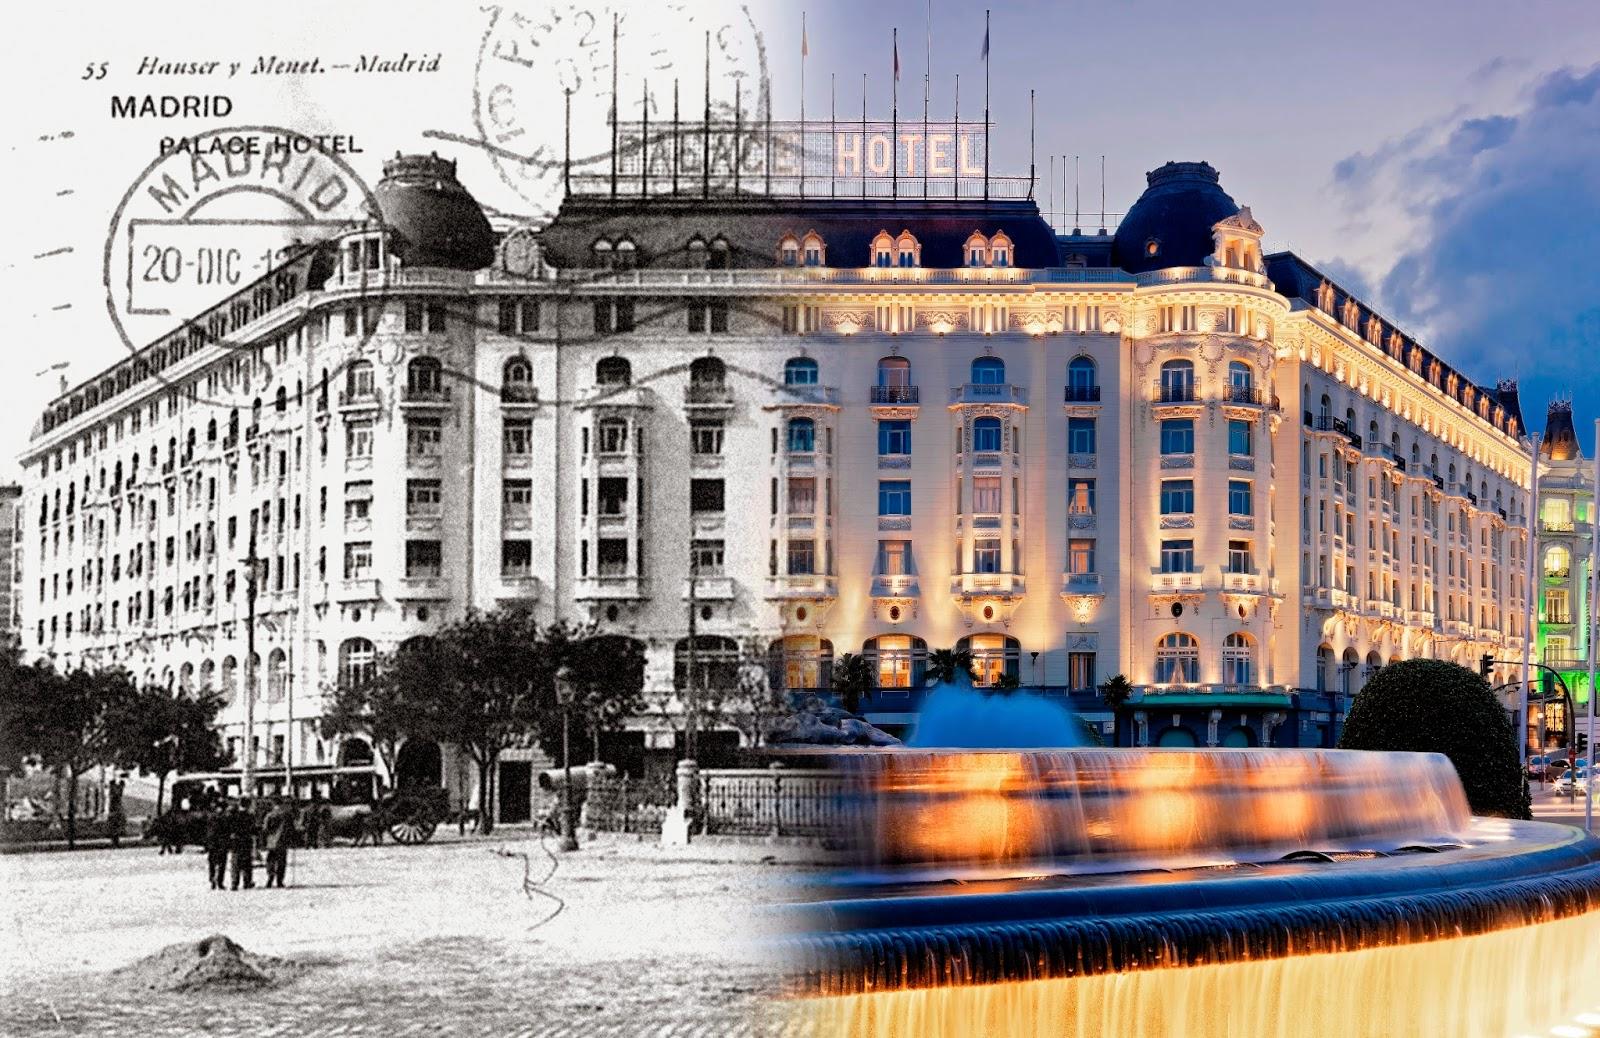 Tal d a como hoy en madrid 12 octubre 1912 se inaugura for Hoteles gran lujo madrid